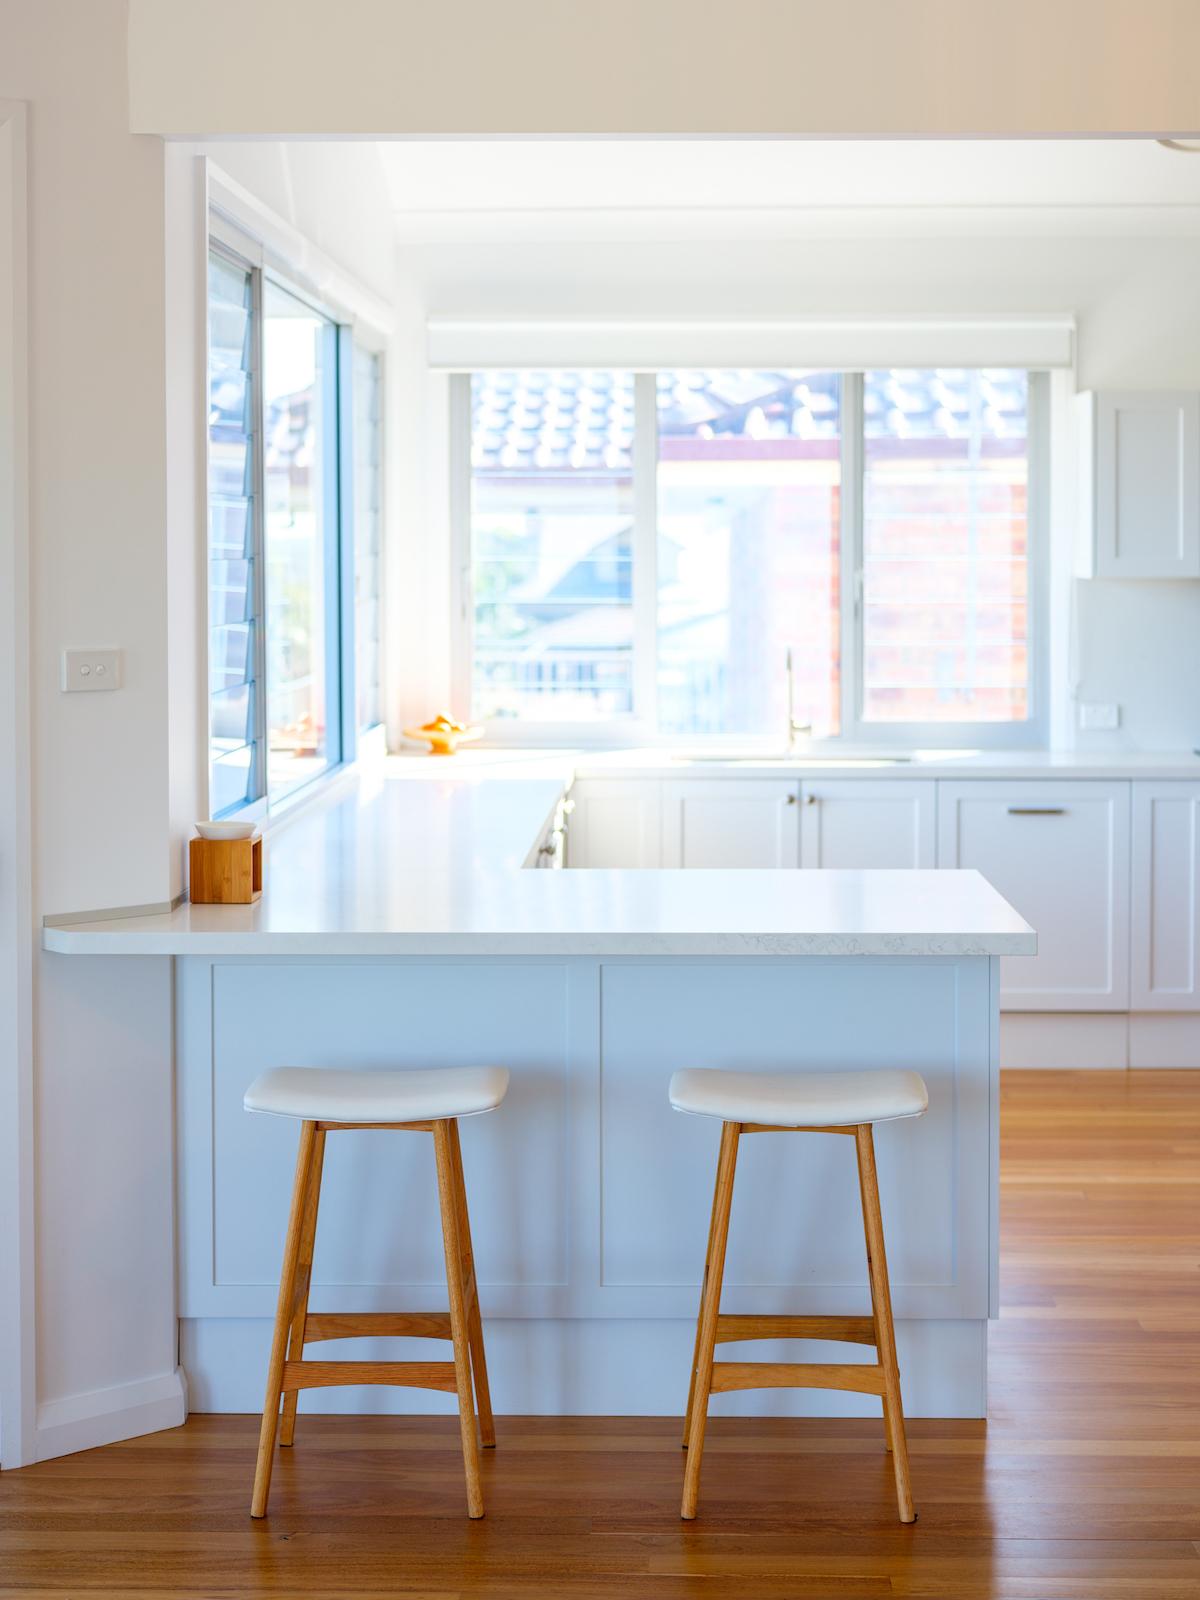 shaker style kitchen cabinets Killcare central coast building designer.jpg